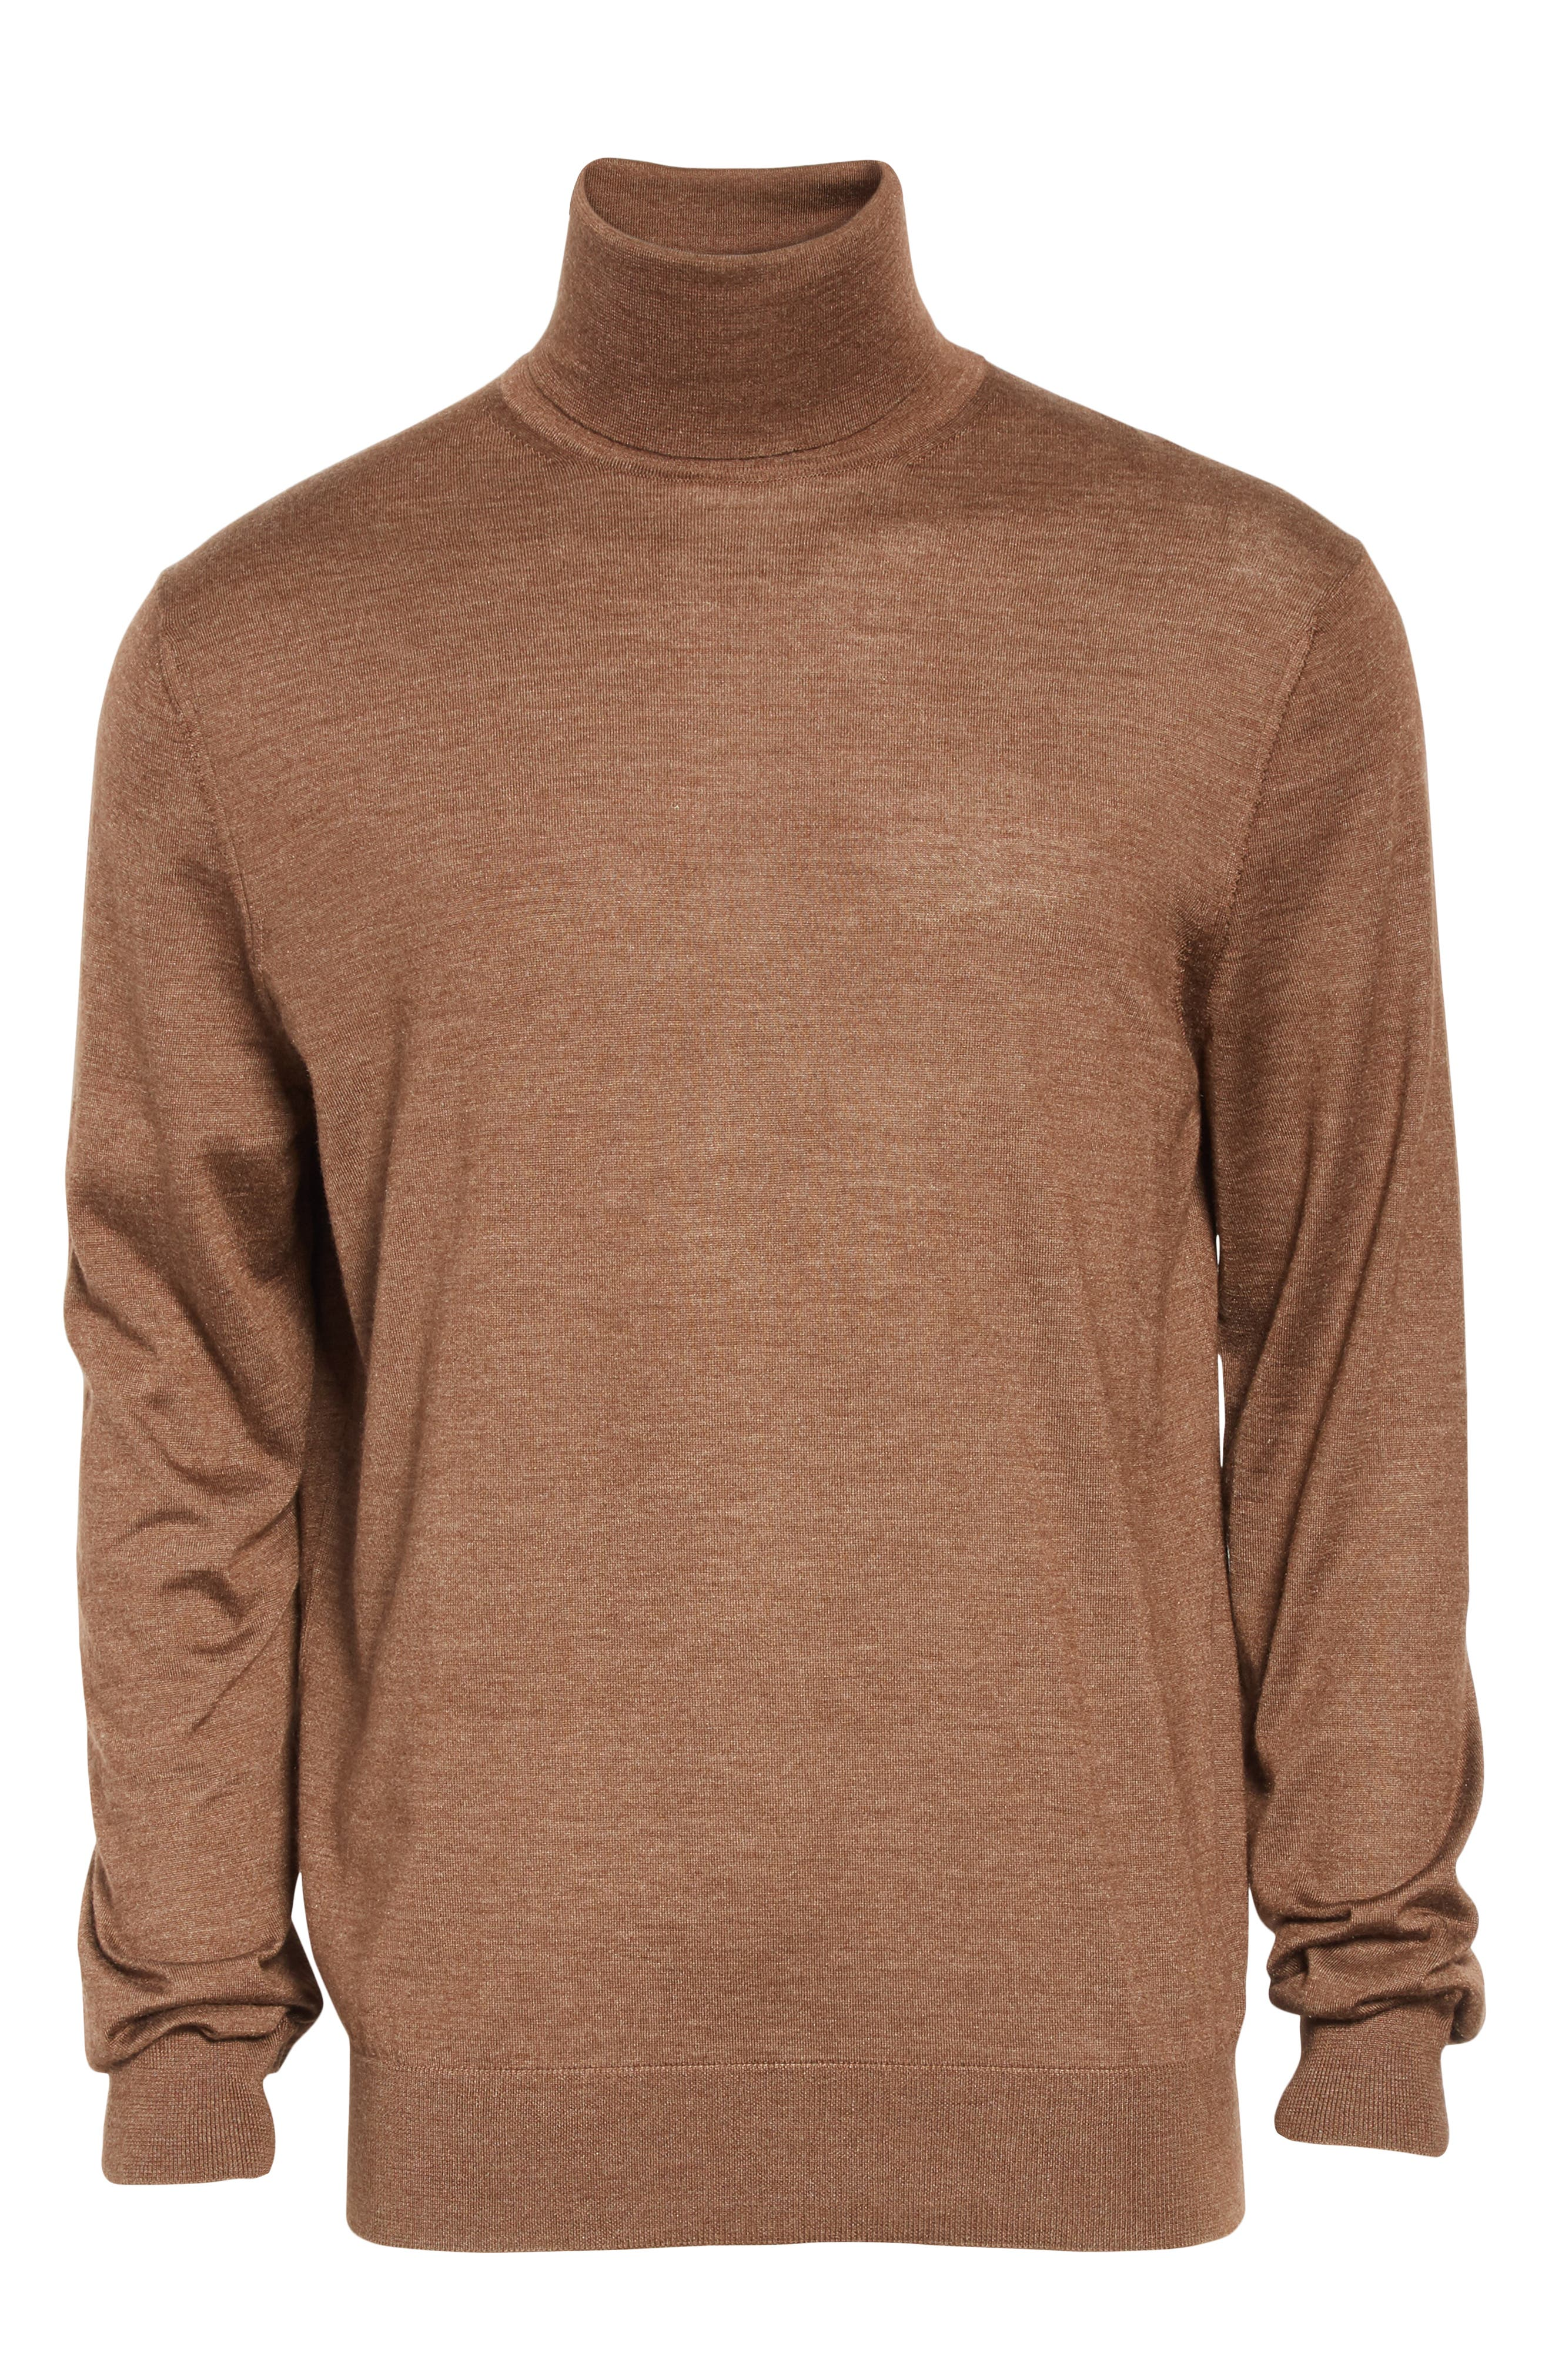 Cashmere & Silk Turtleneck Sweater,                             Alternate thumbnail 6, color,                             252